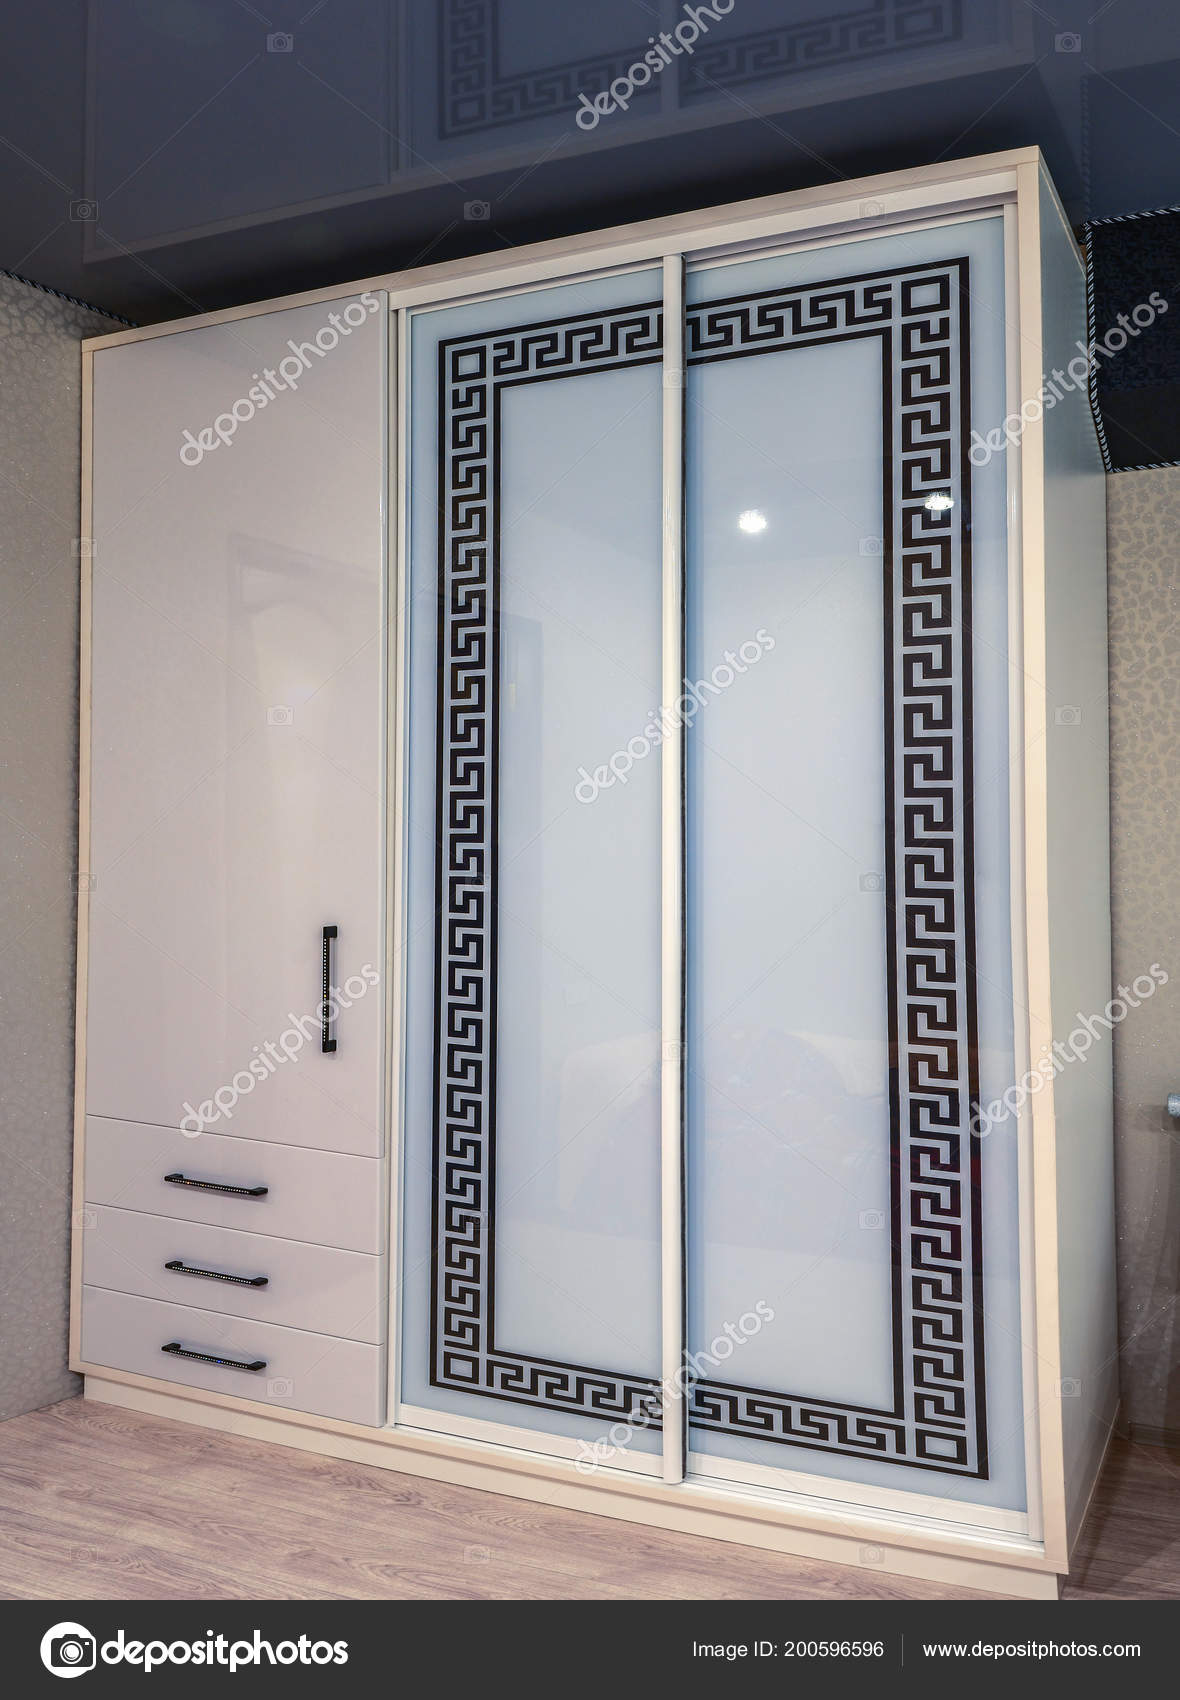 Armadio Con Ante Scorrevoli In Vetro.Bianco Armadio Scorrevole Con Ante Scorrevoli In Vetro Foto Stock